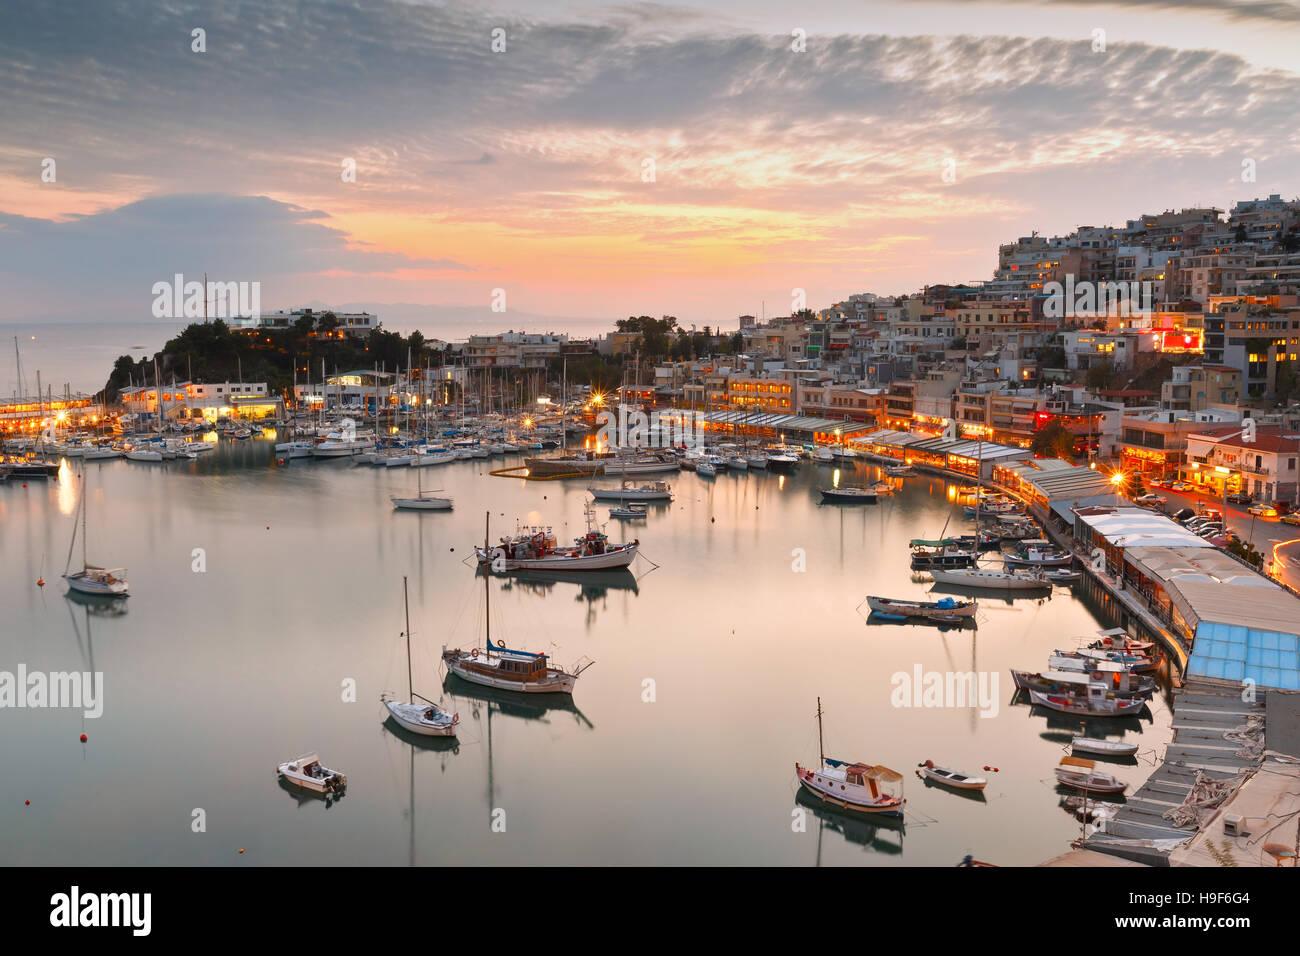 Abends Blick auf Mikrolimano Marina in Athen, Griechenland. Stockbild